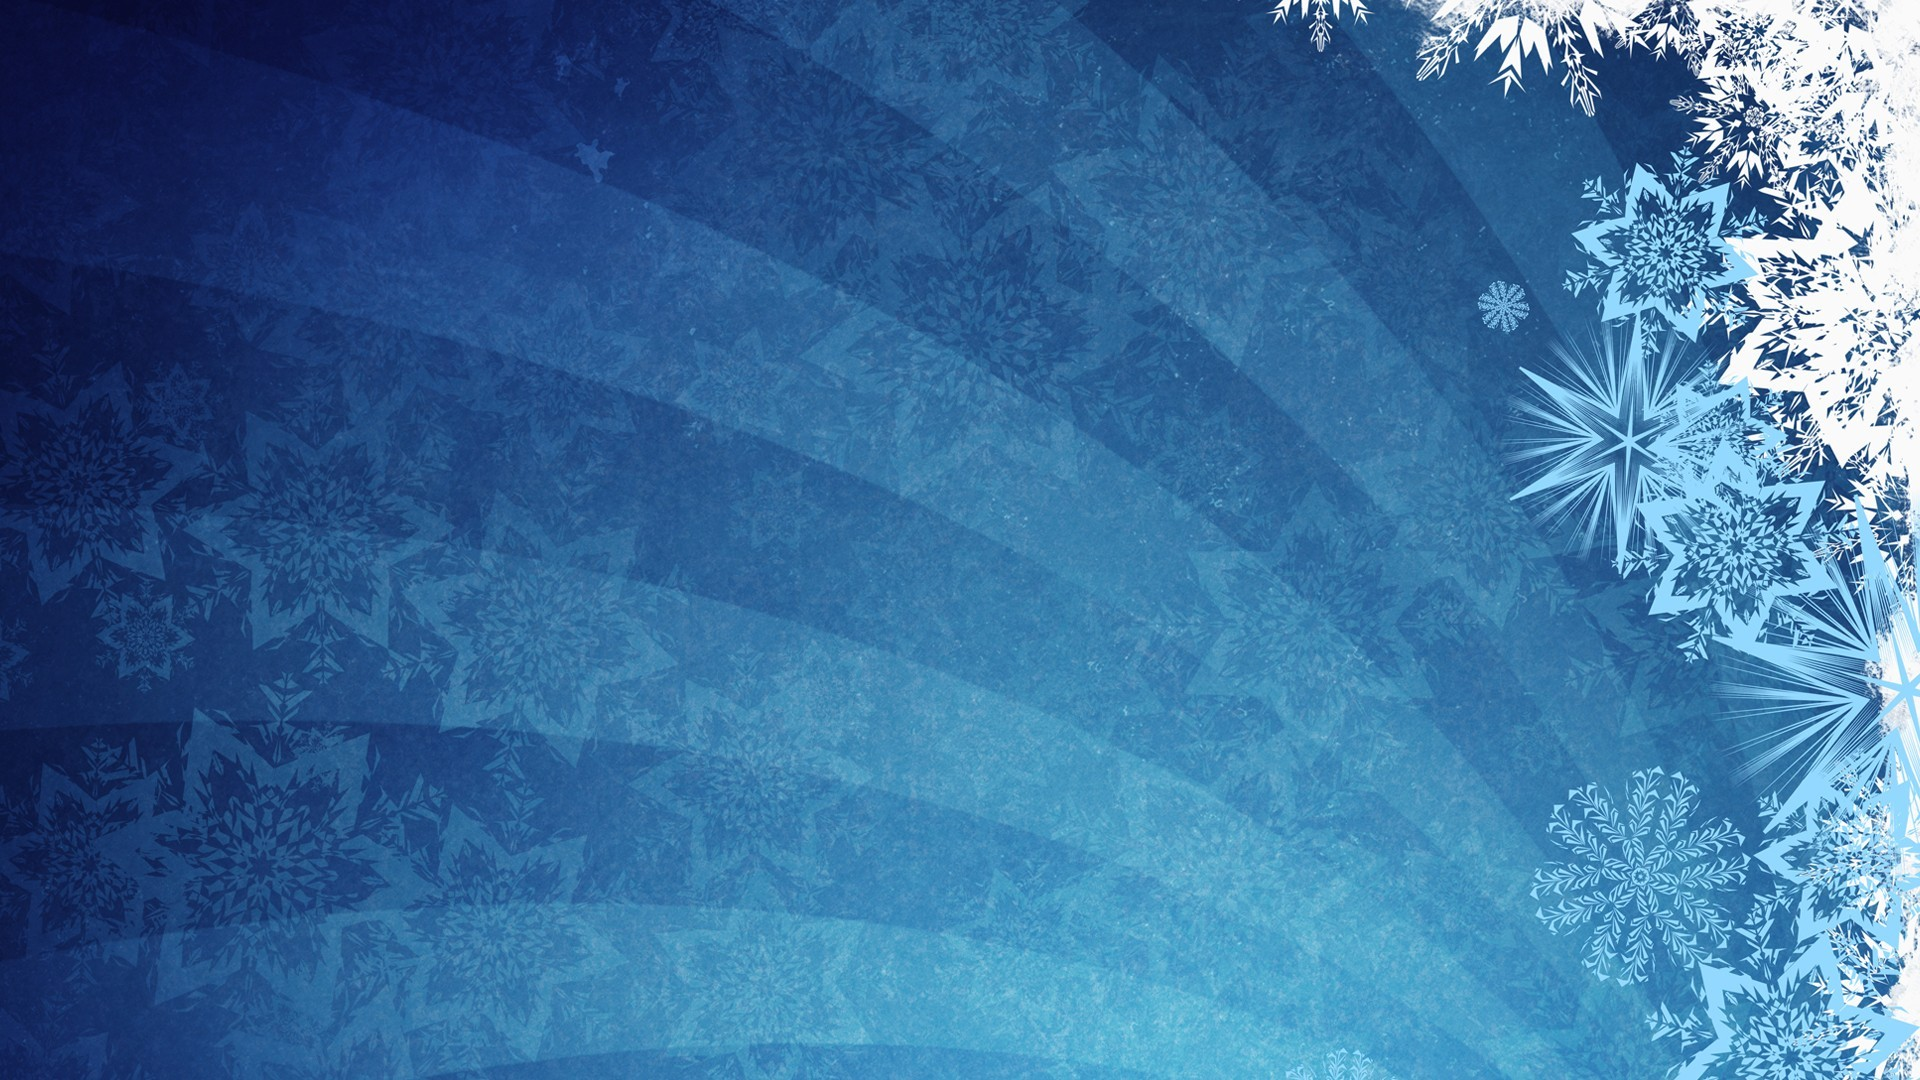 1920x1080 Winter Grunge Vector Snowflakes Graphics Wallpaper Allwallpaper